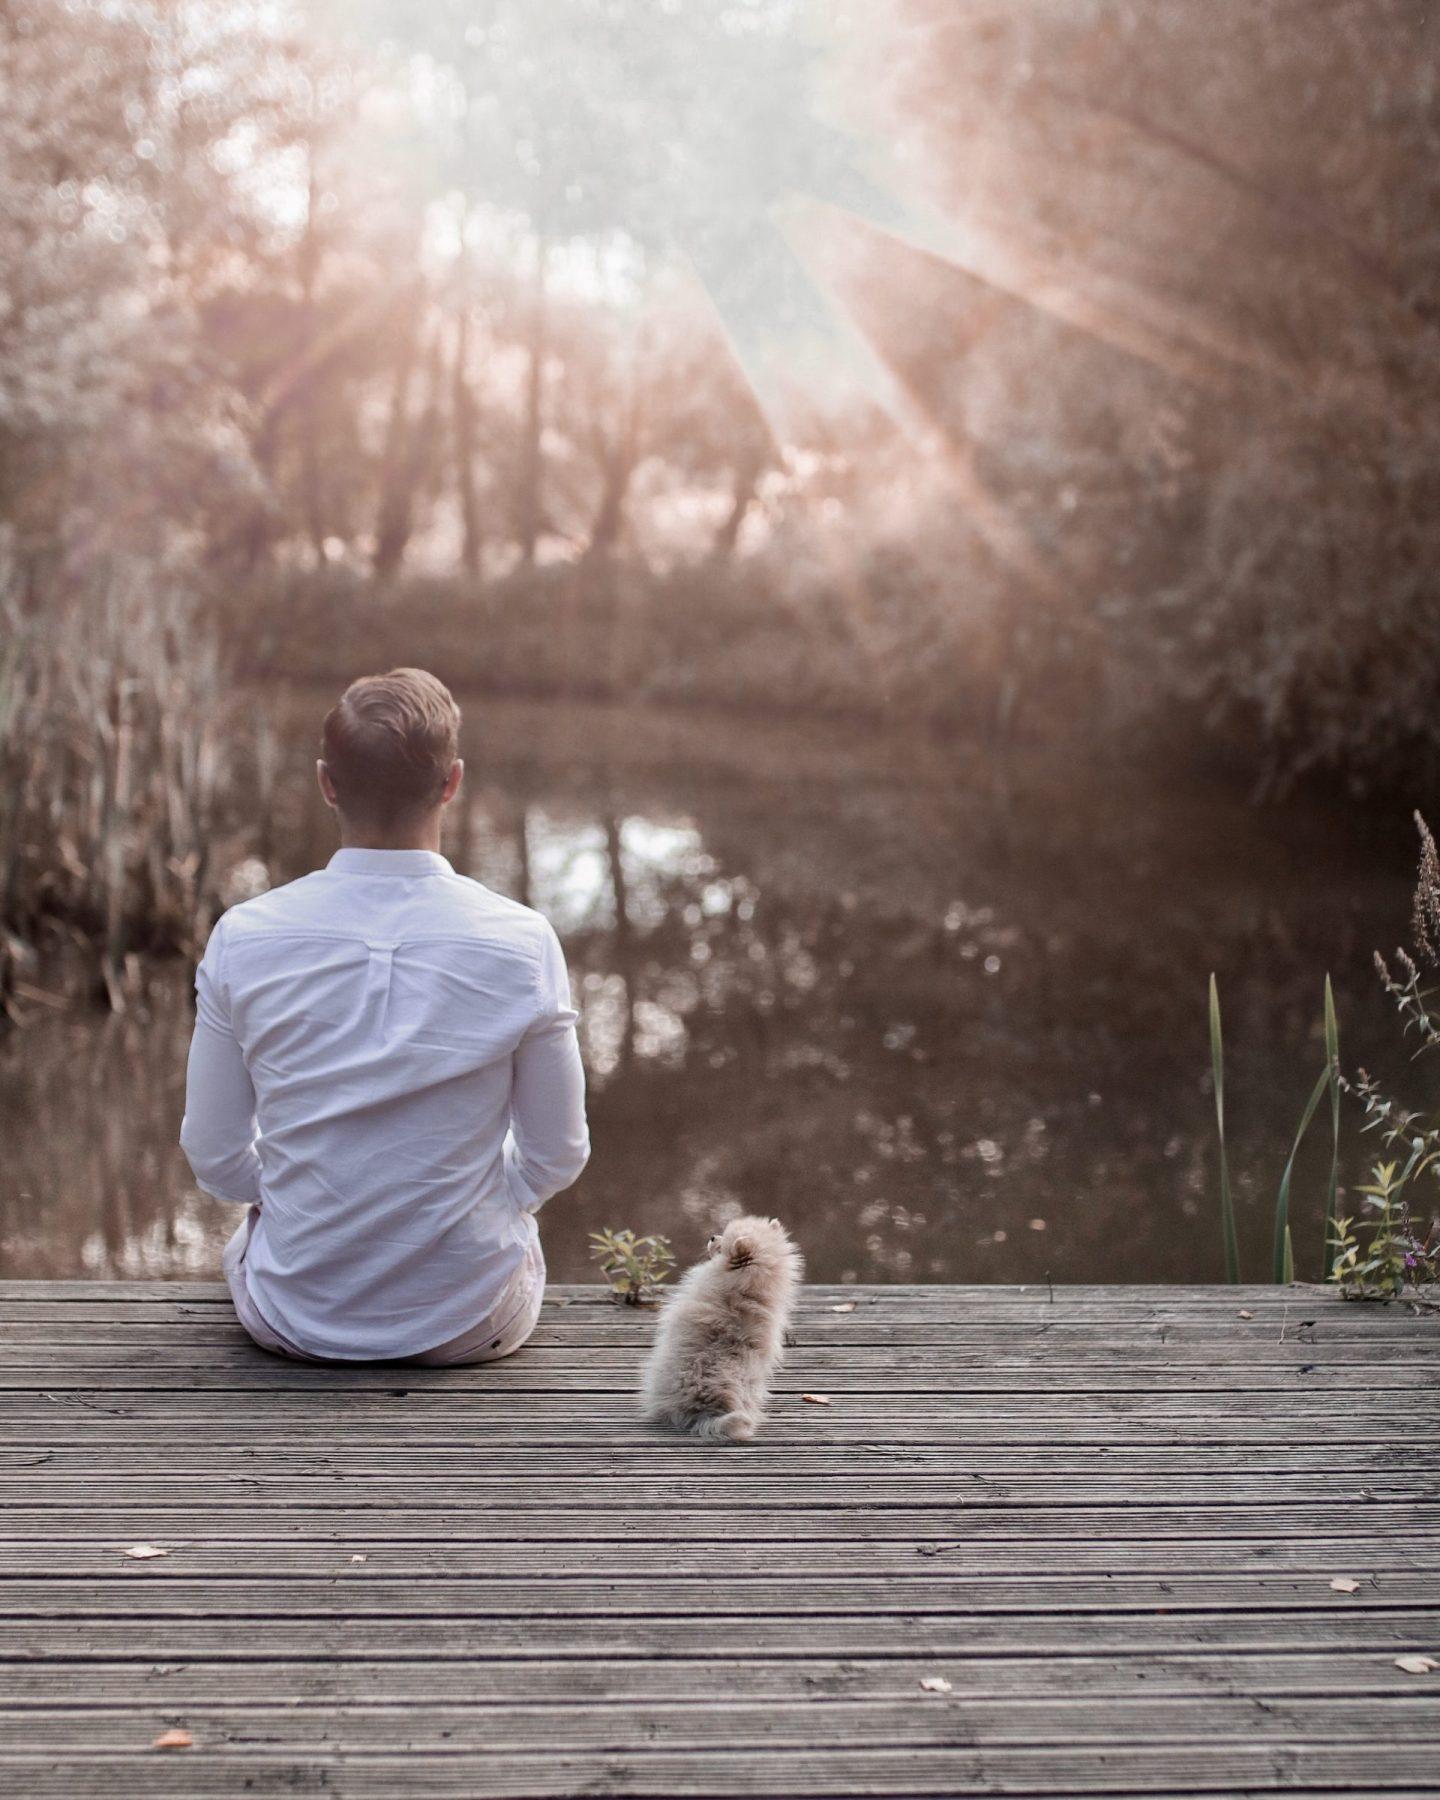 Piriteze Pet Allergy Twenty First Century Gent